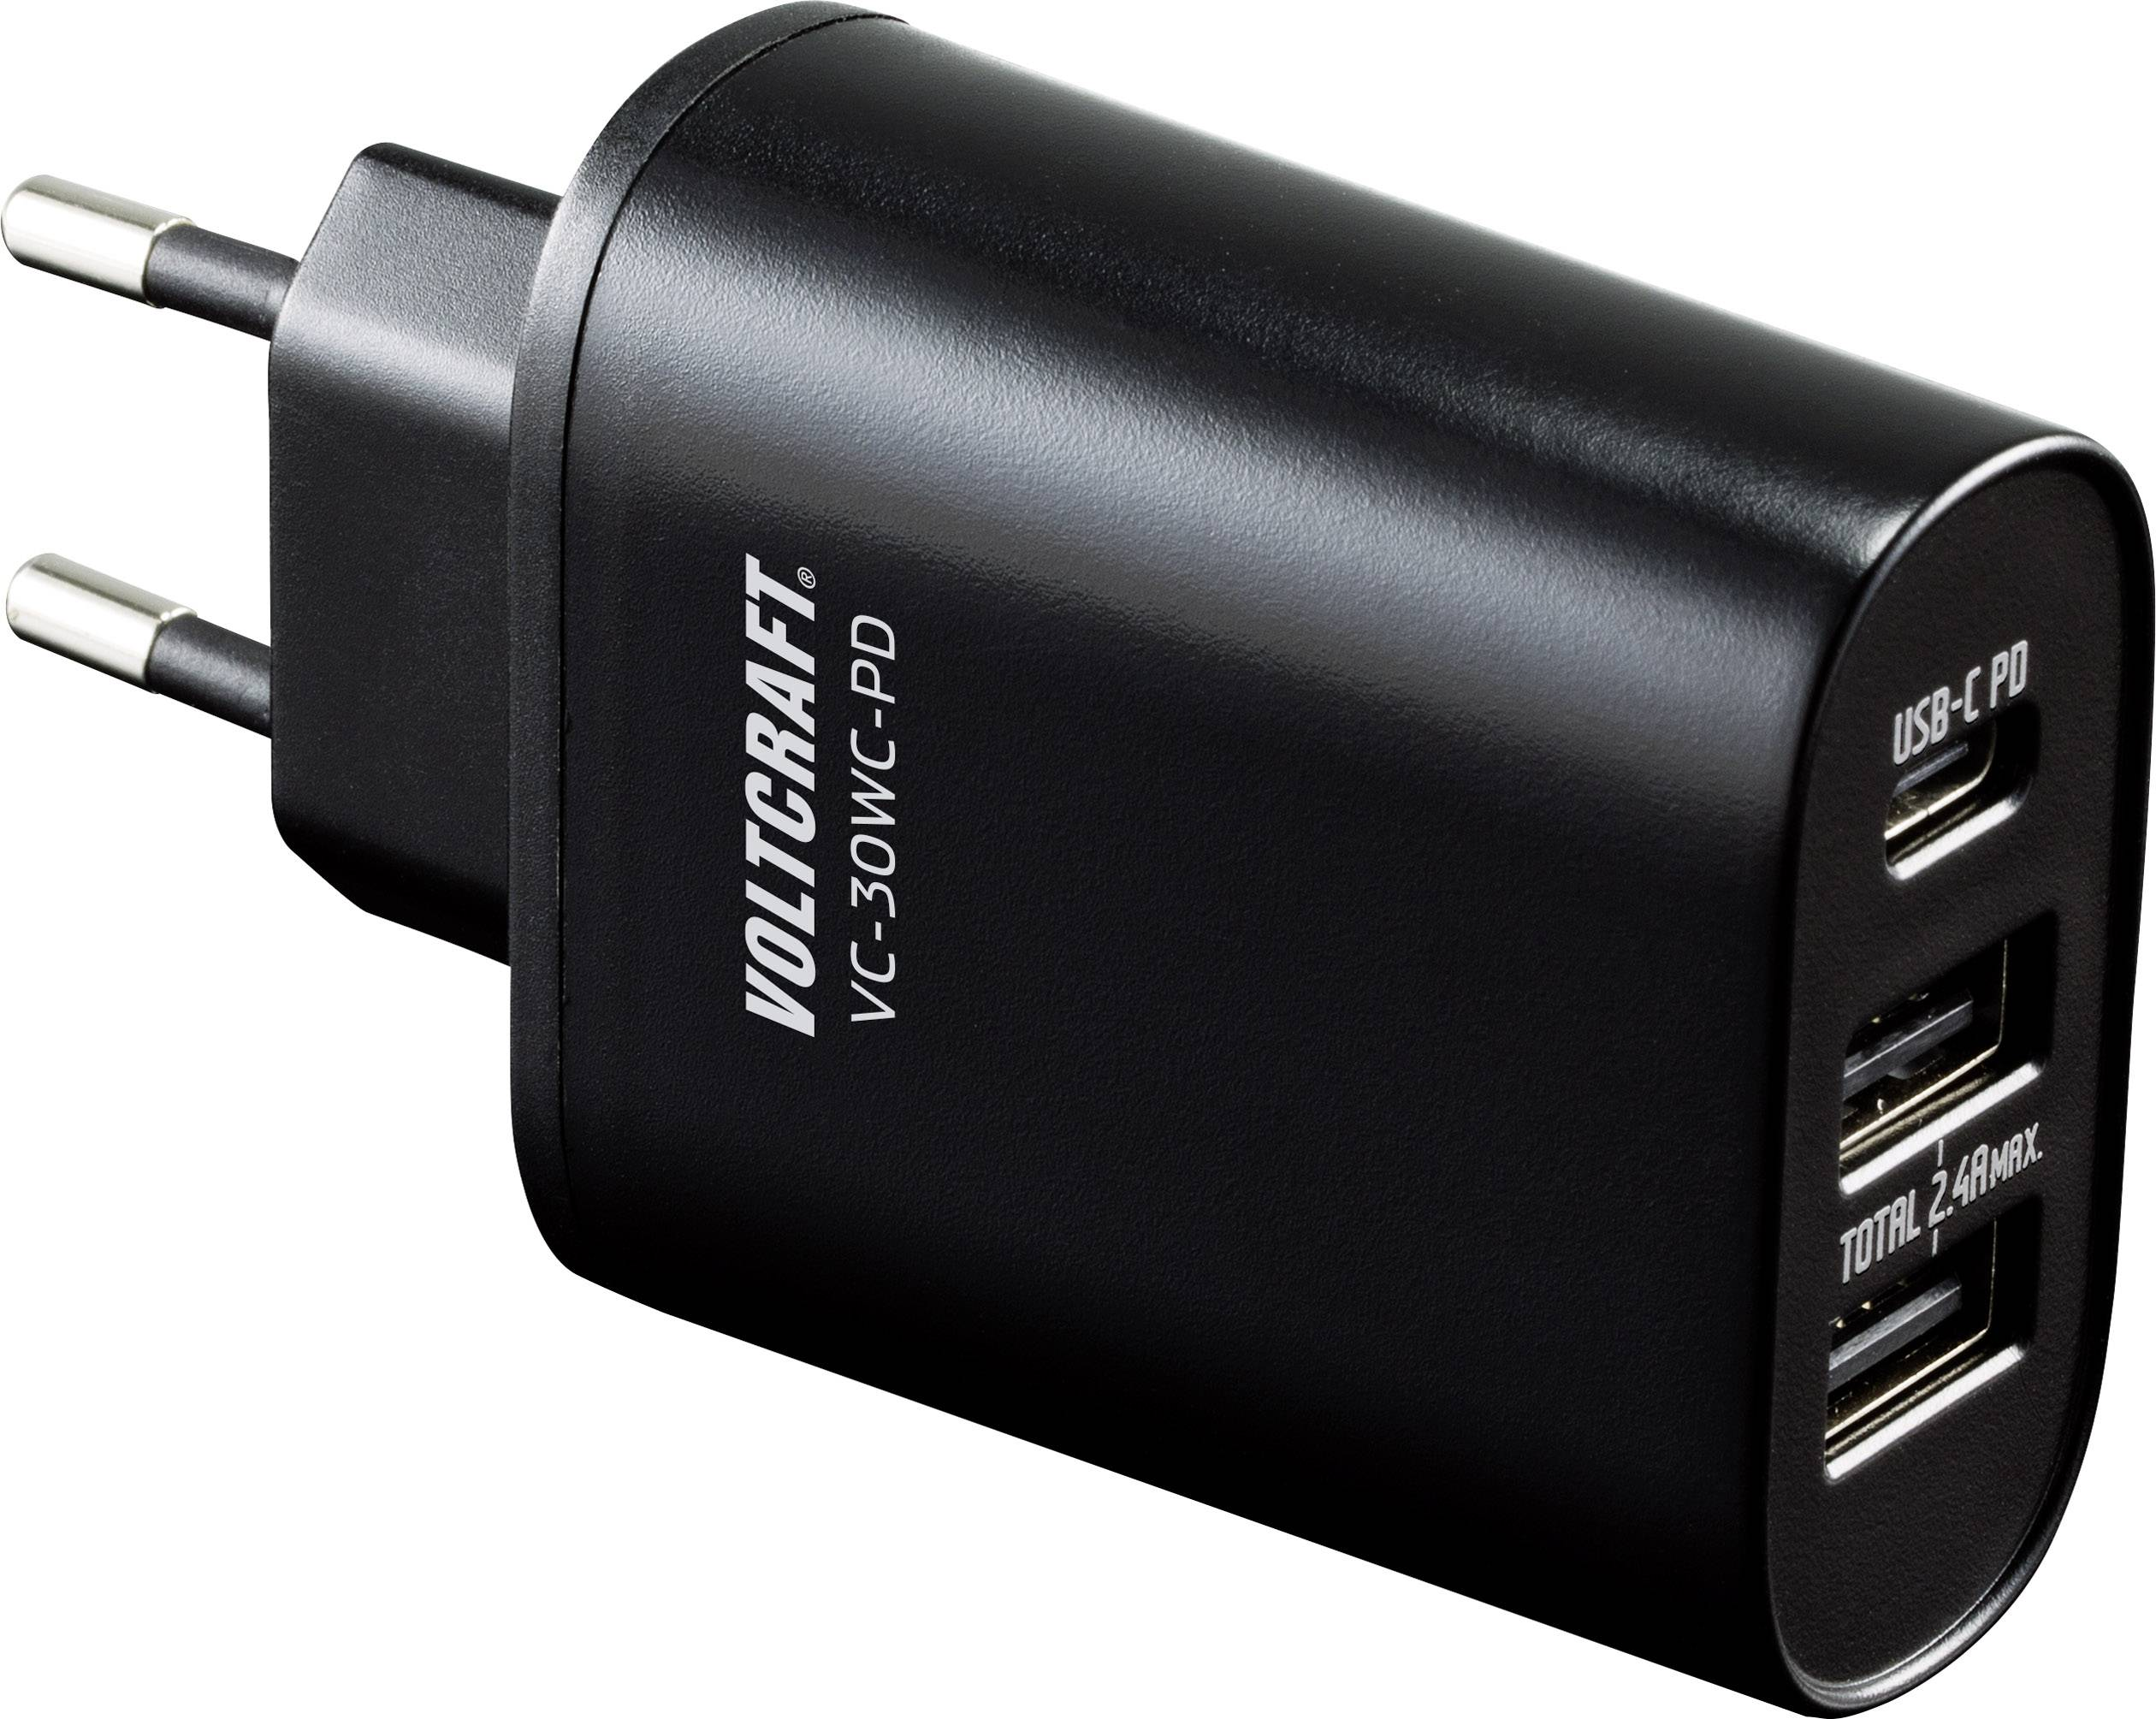 VOLTCRAFT VC 30WC PD VC 30WC PD USB Ladegerät Steckdose 3 x USB, USB C™ Buchse